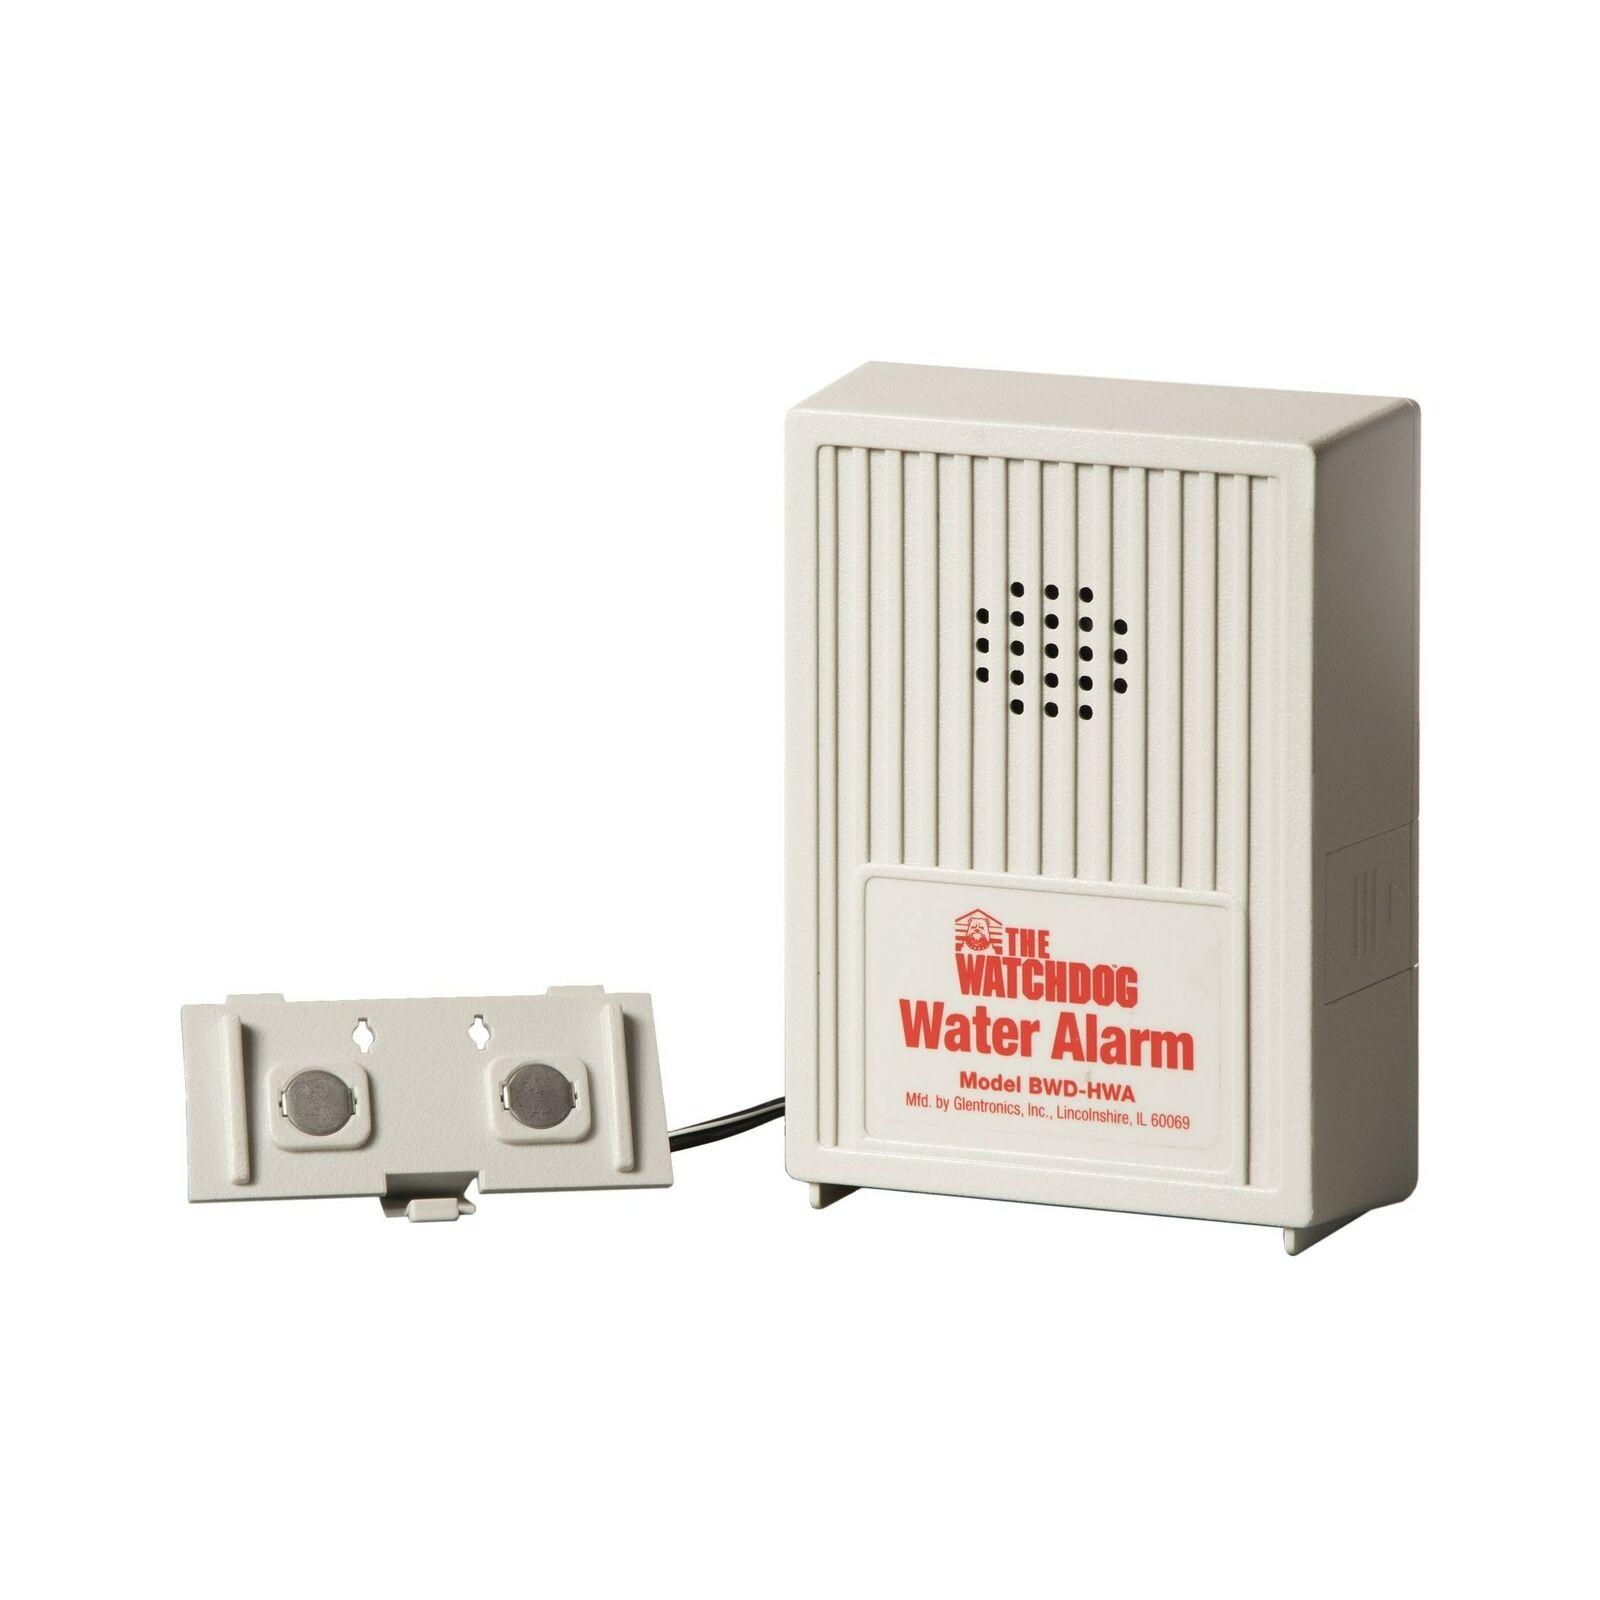 Nrpfell Detector de Metales a Prueba de Agua B/úSqueda de 360 Grados B/úSqueda de Tesoros Pinpointing Sonda para Localizar Joyer/íA de Plata con Monedas de Oro Totalmente Impermeable